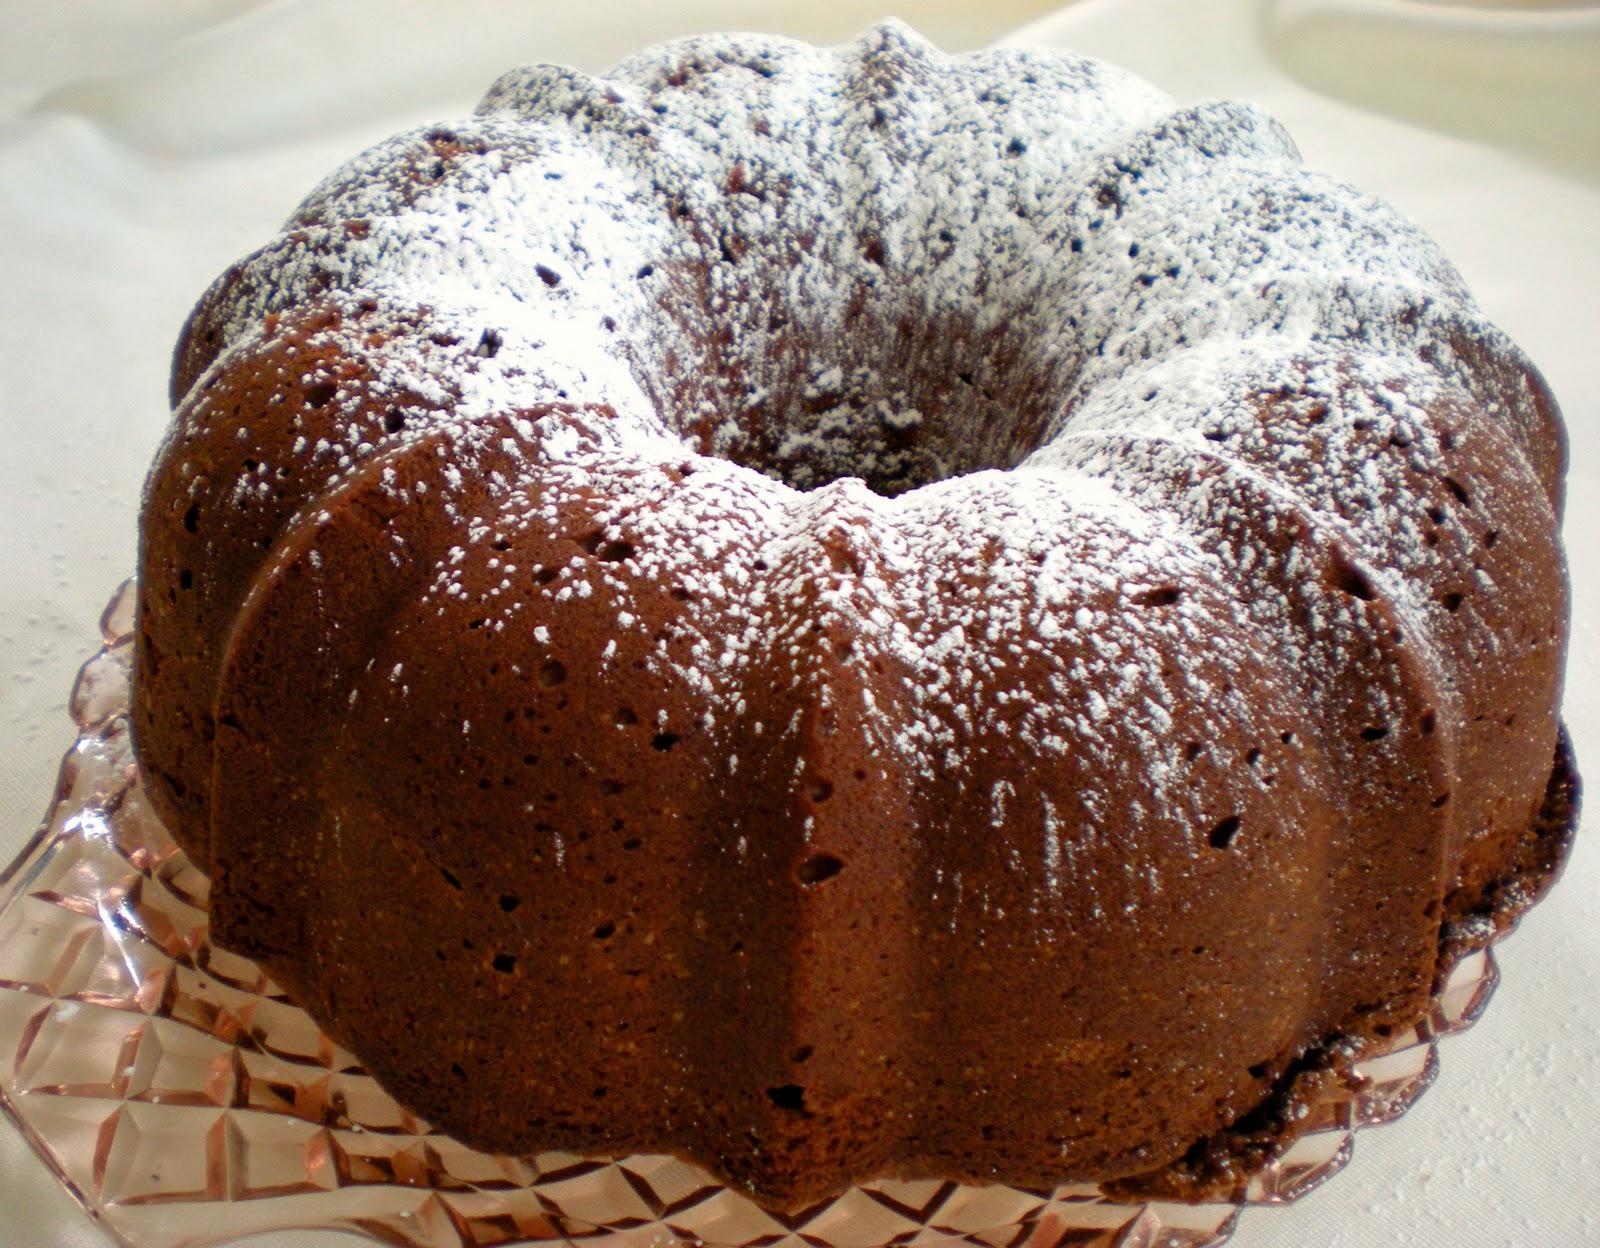 ... peanut butter glaze bittersweet chocolate pound chocolate pound cake